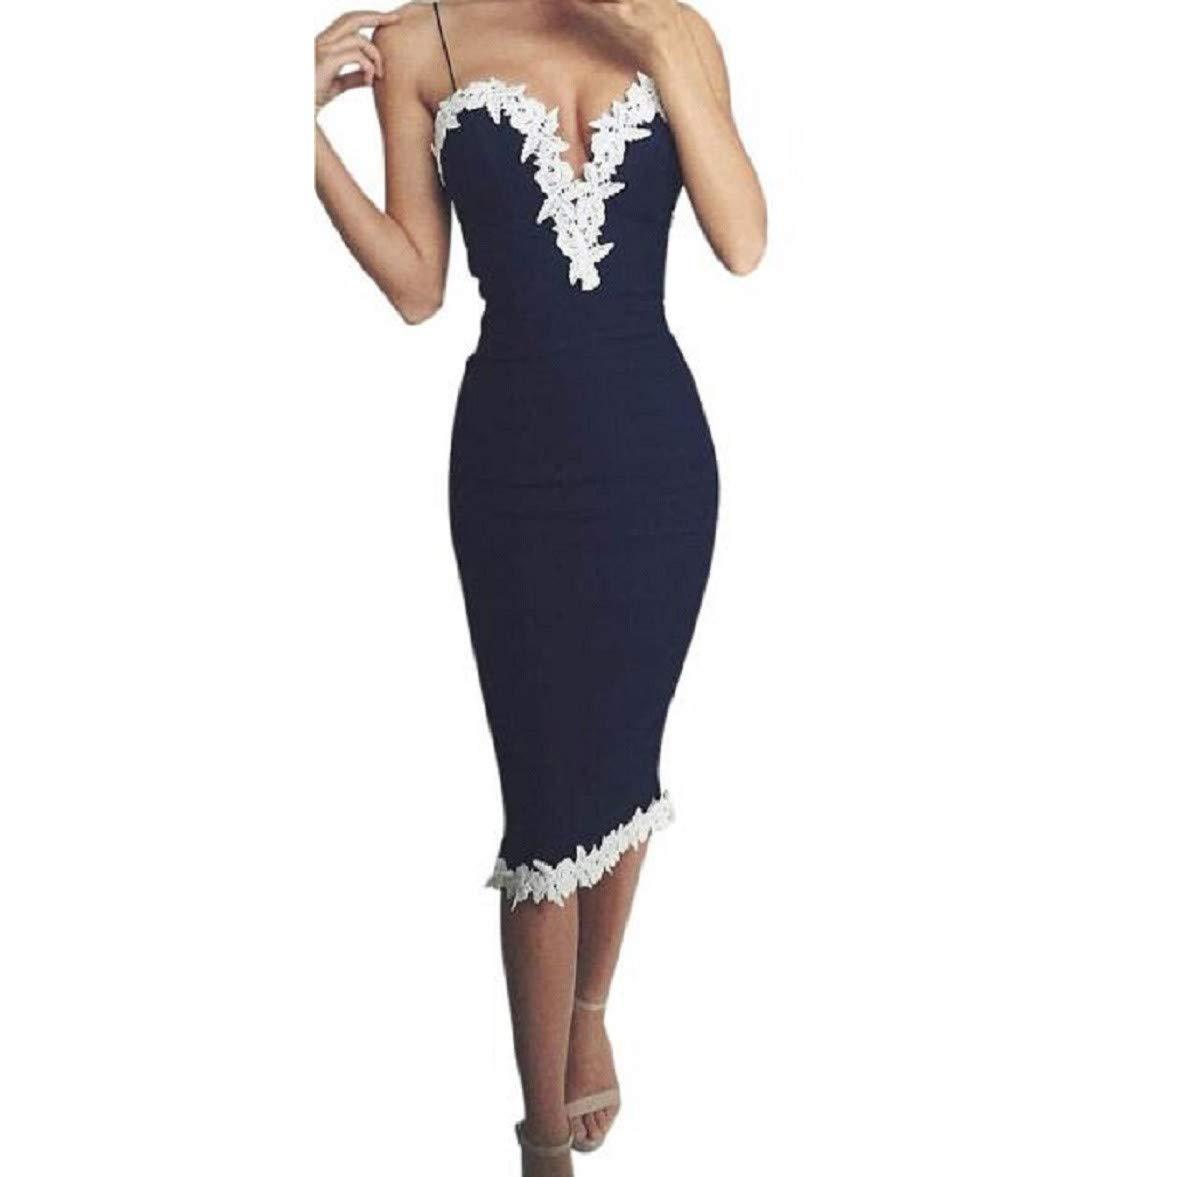 Knee Length Bodycon Dress for Women Elegant, Lace Edge Spaghetti Strap Cocktail Dress v-Neck Mini Dress Clubwear(Blue, M)